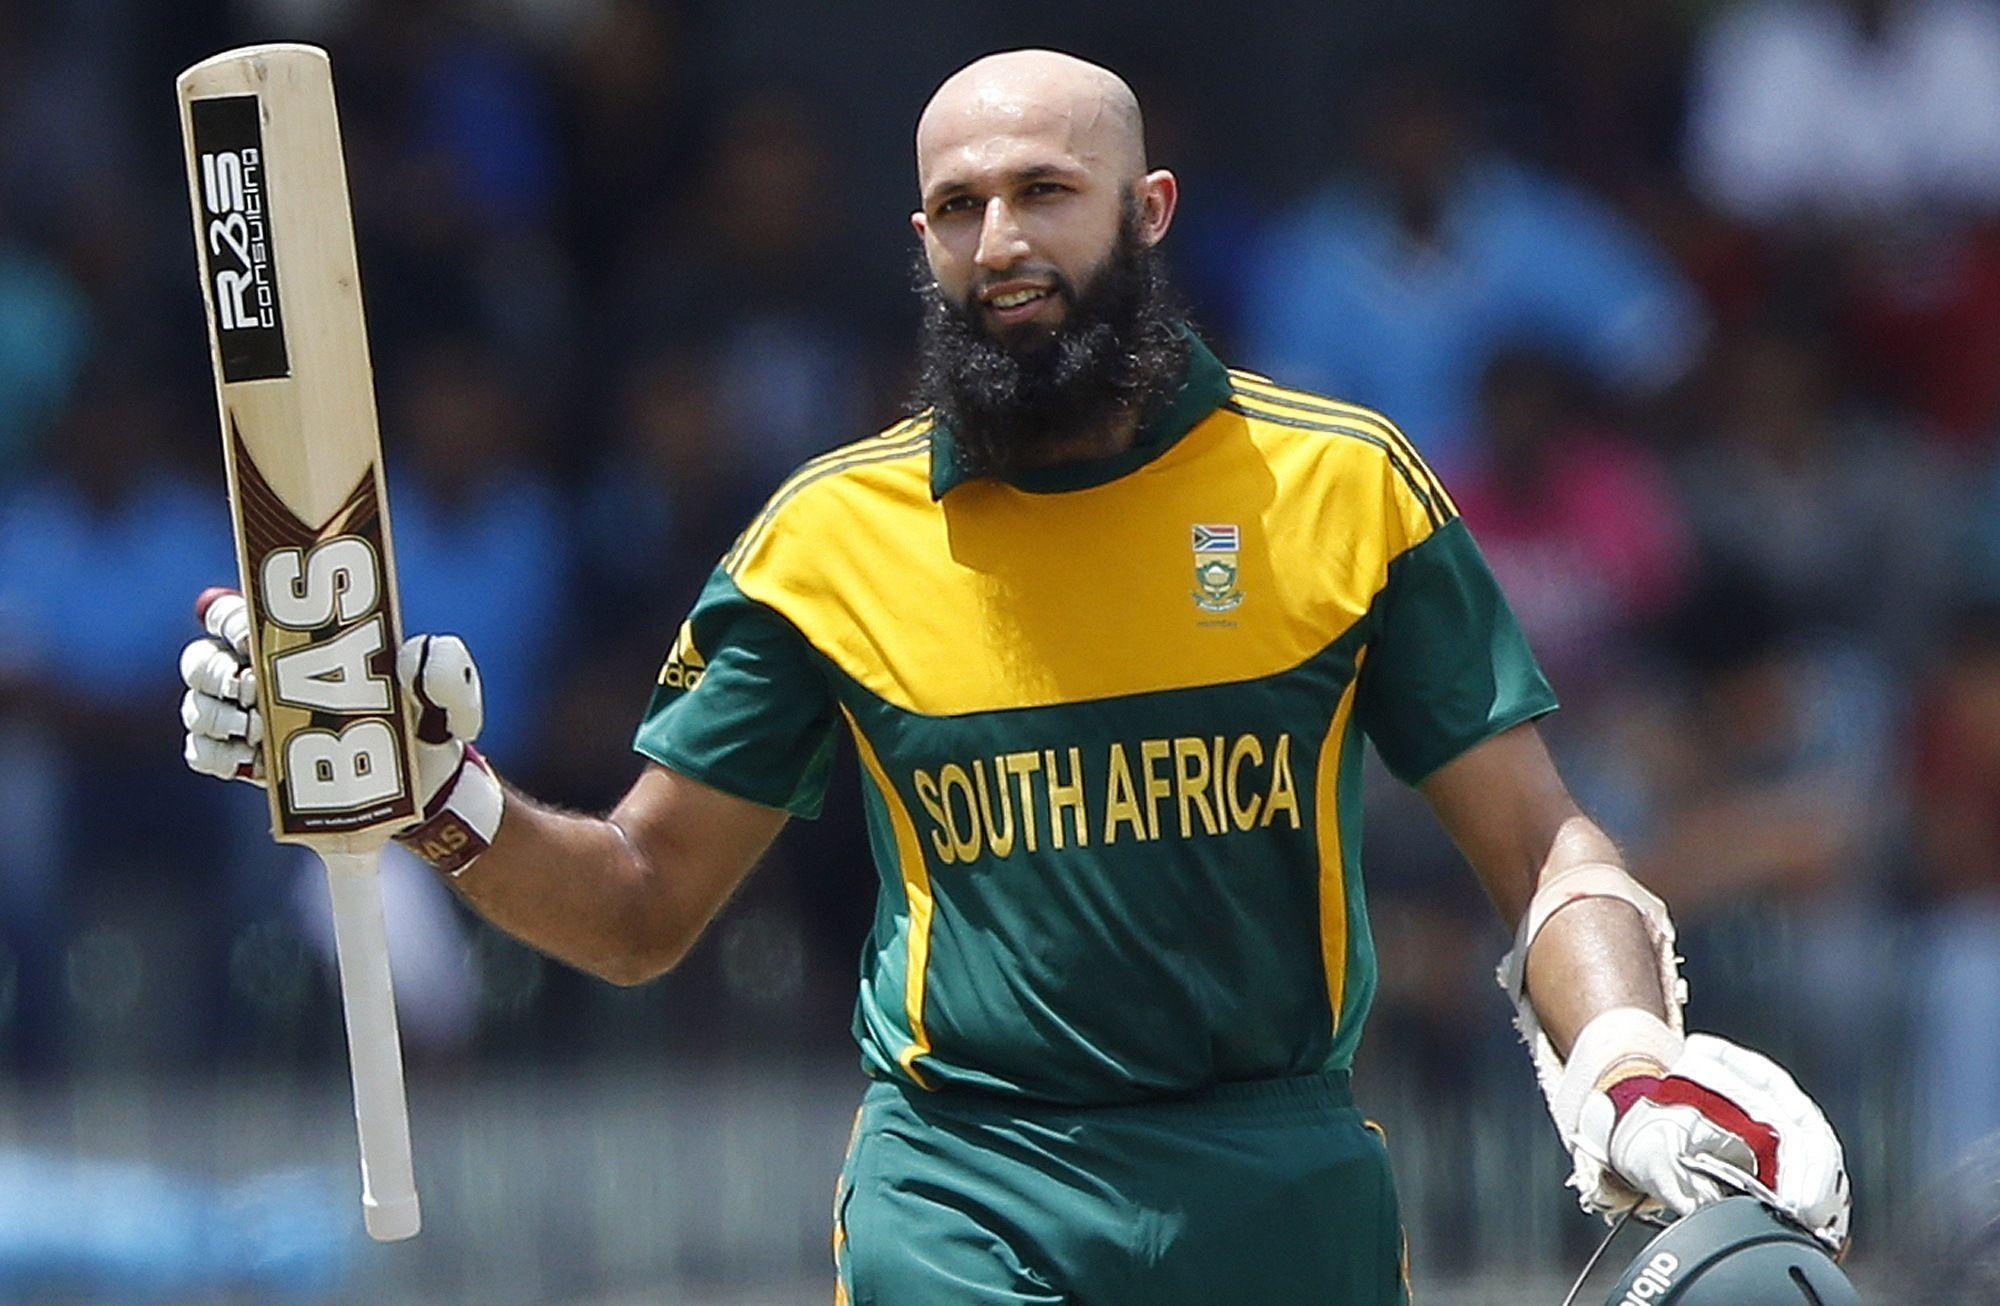 Cricket Wallpapers Free Download Hd Latest New Sports Player Images Hashim Amla South Africa Cricket Team Sachin Tendulkar